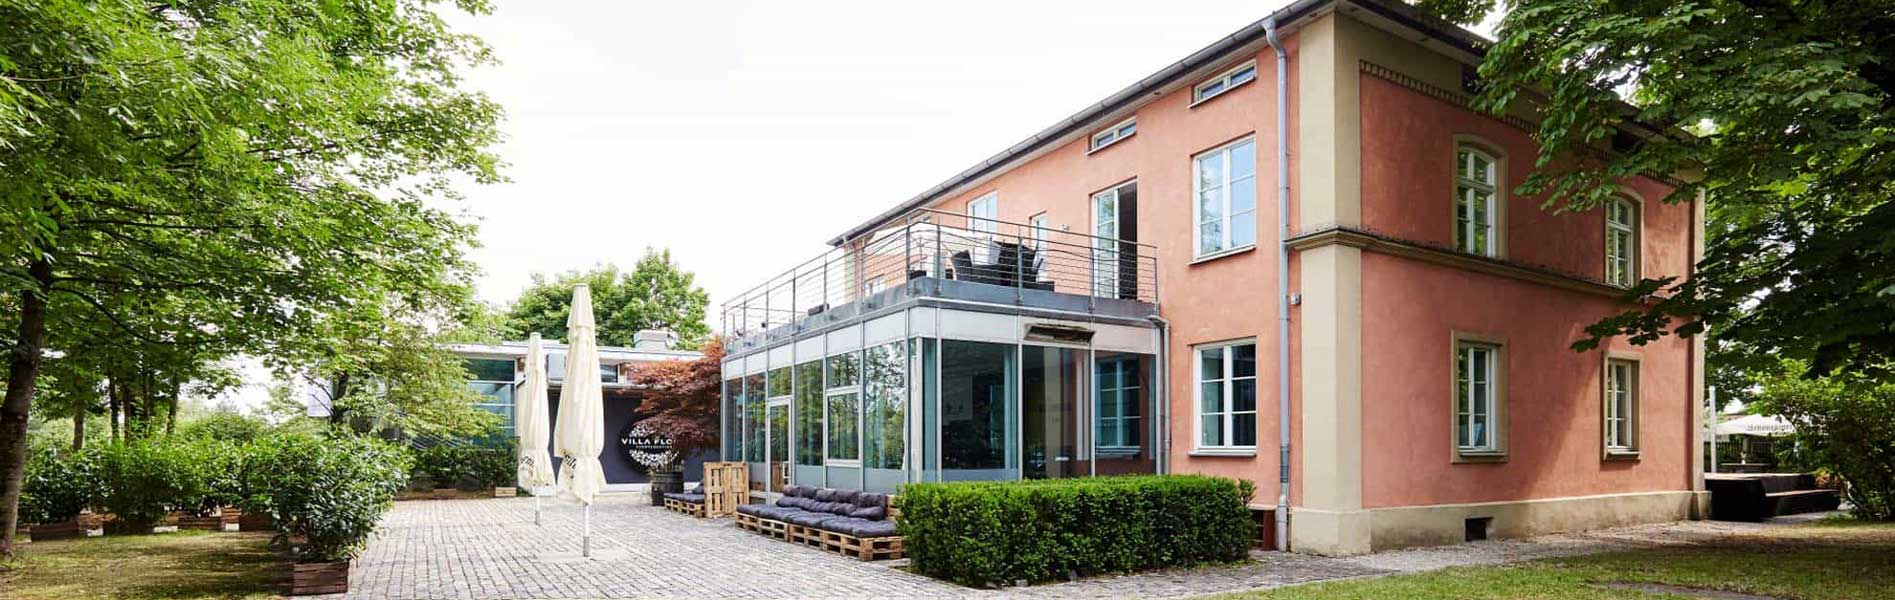 Villa Flora - Eventlocation München - Unikorn Catering & Events _Catering München